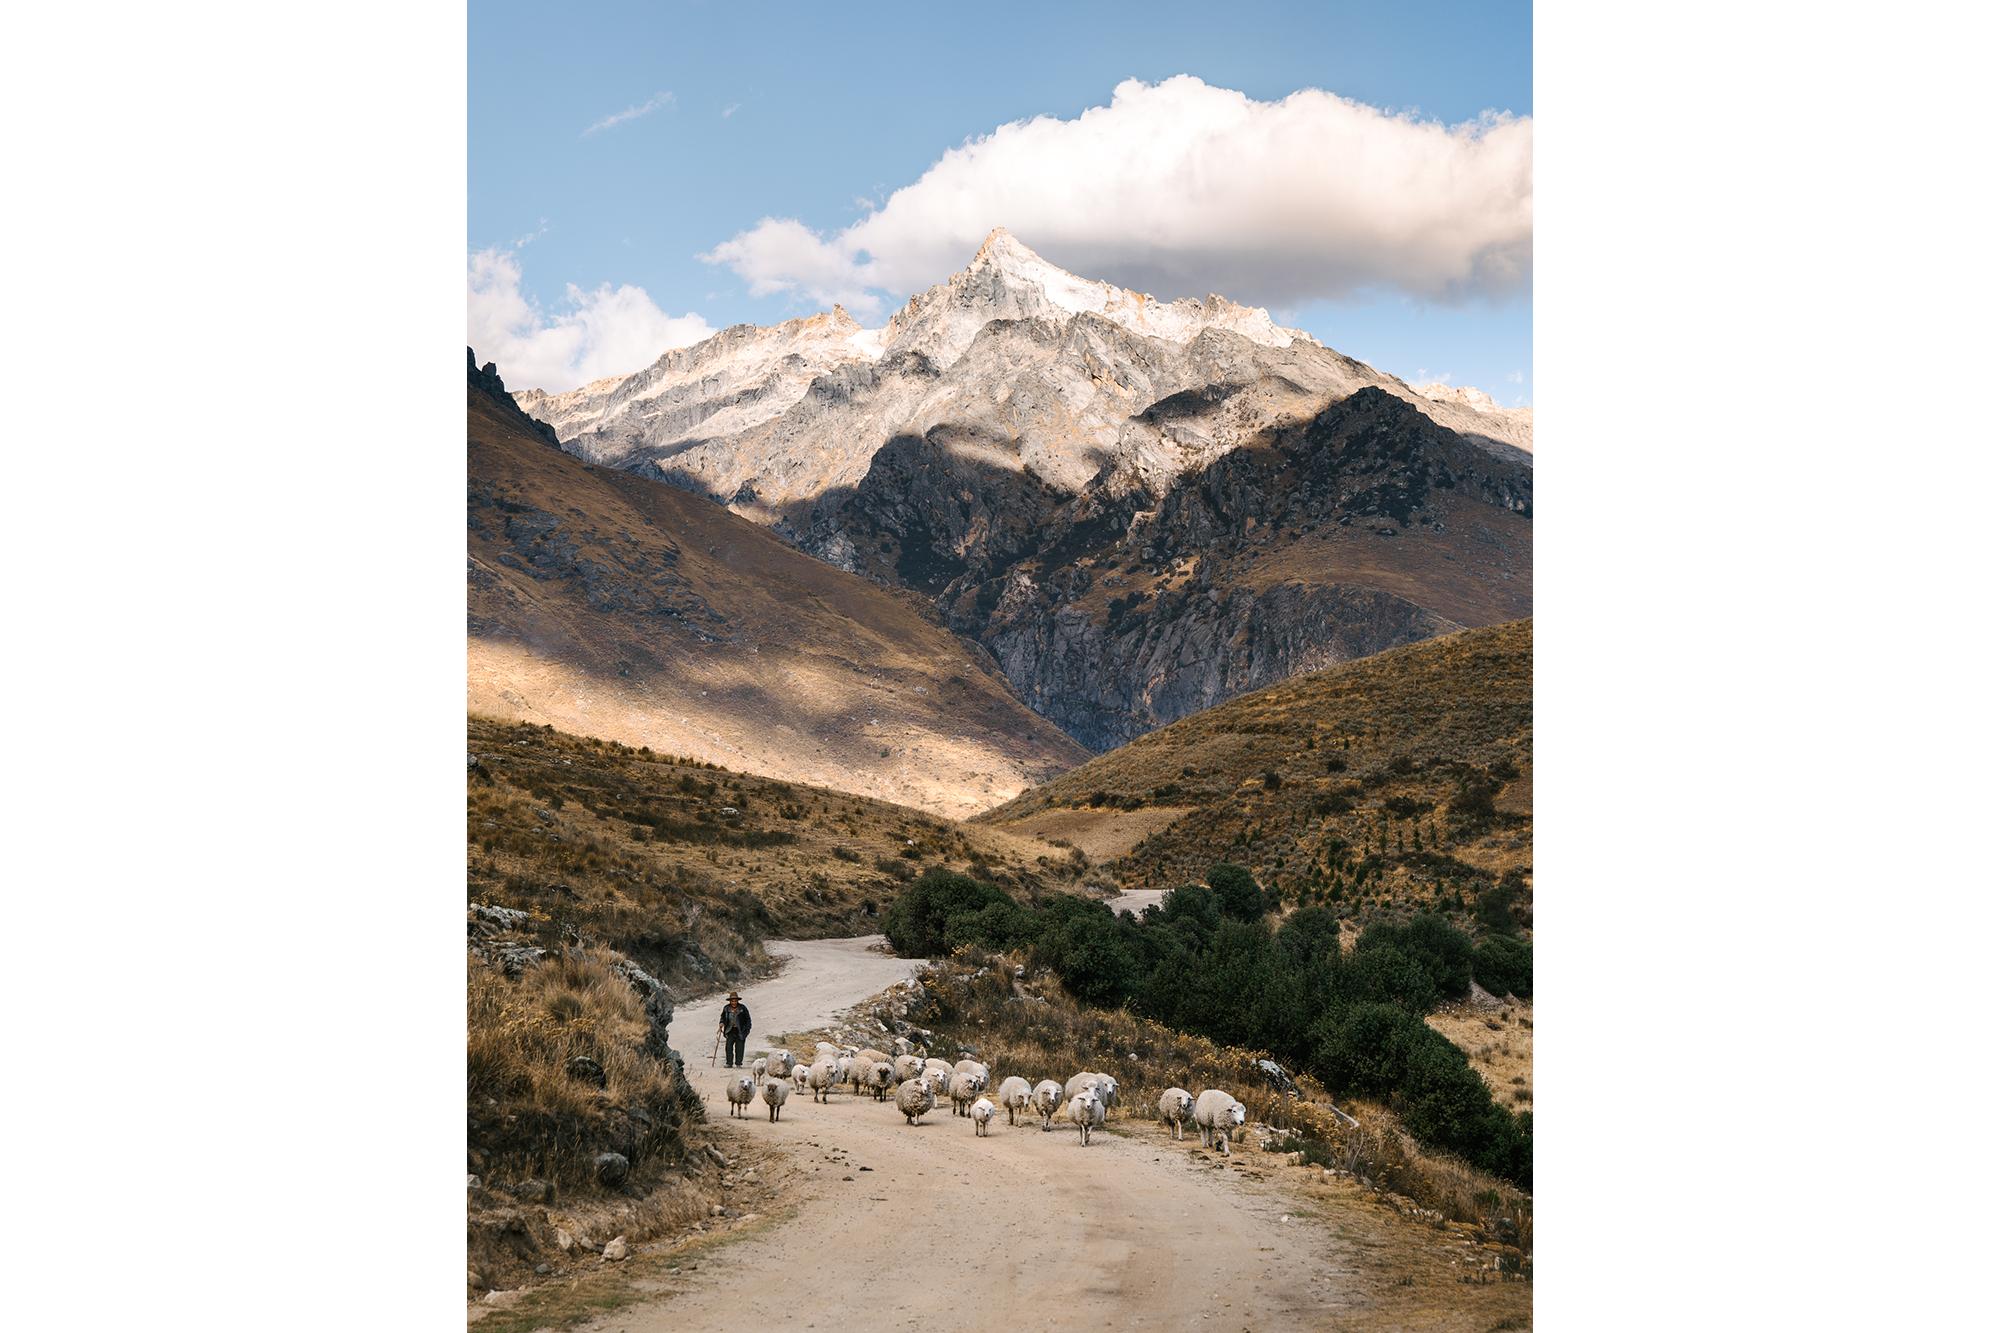 Andean Gridlock